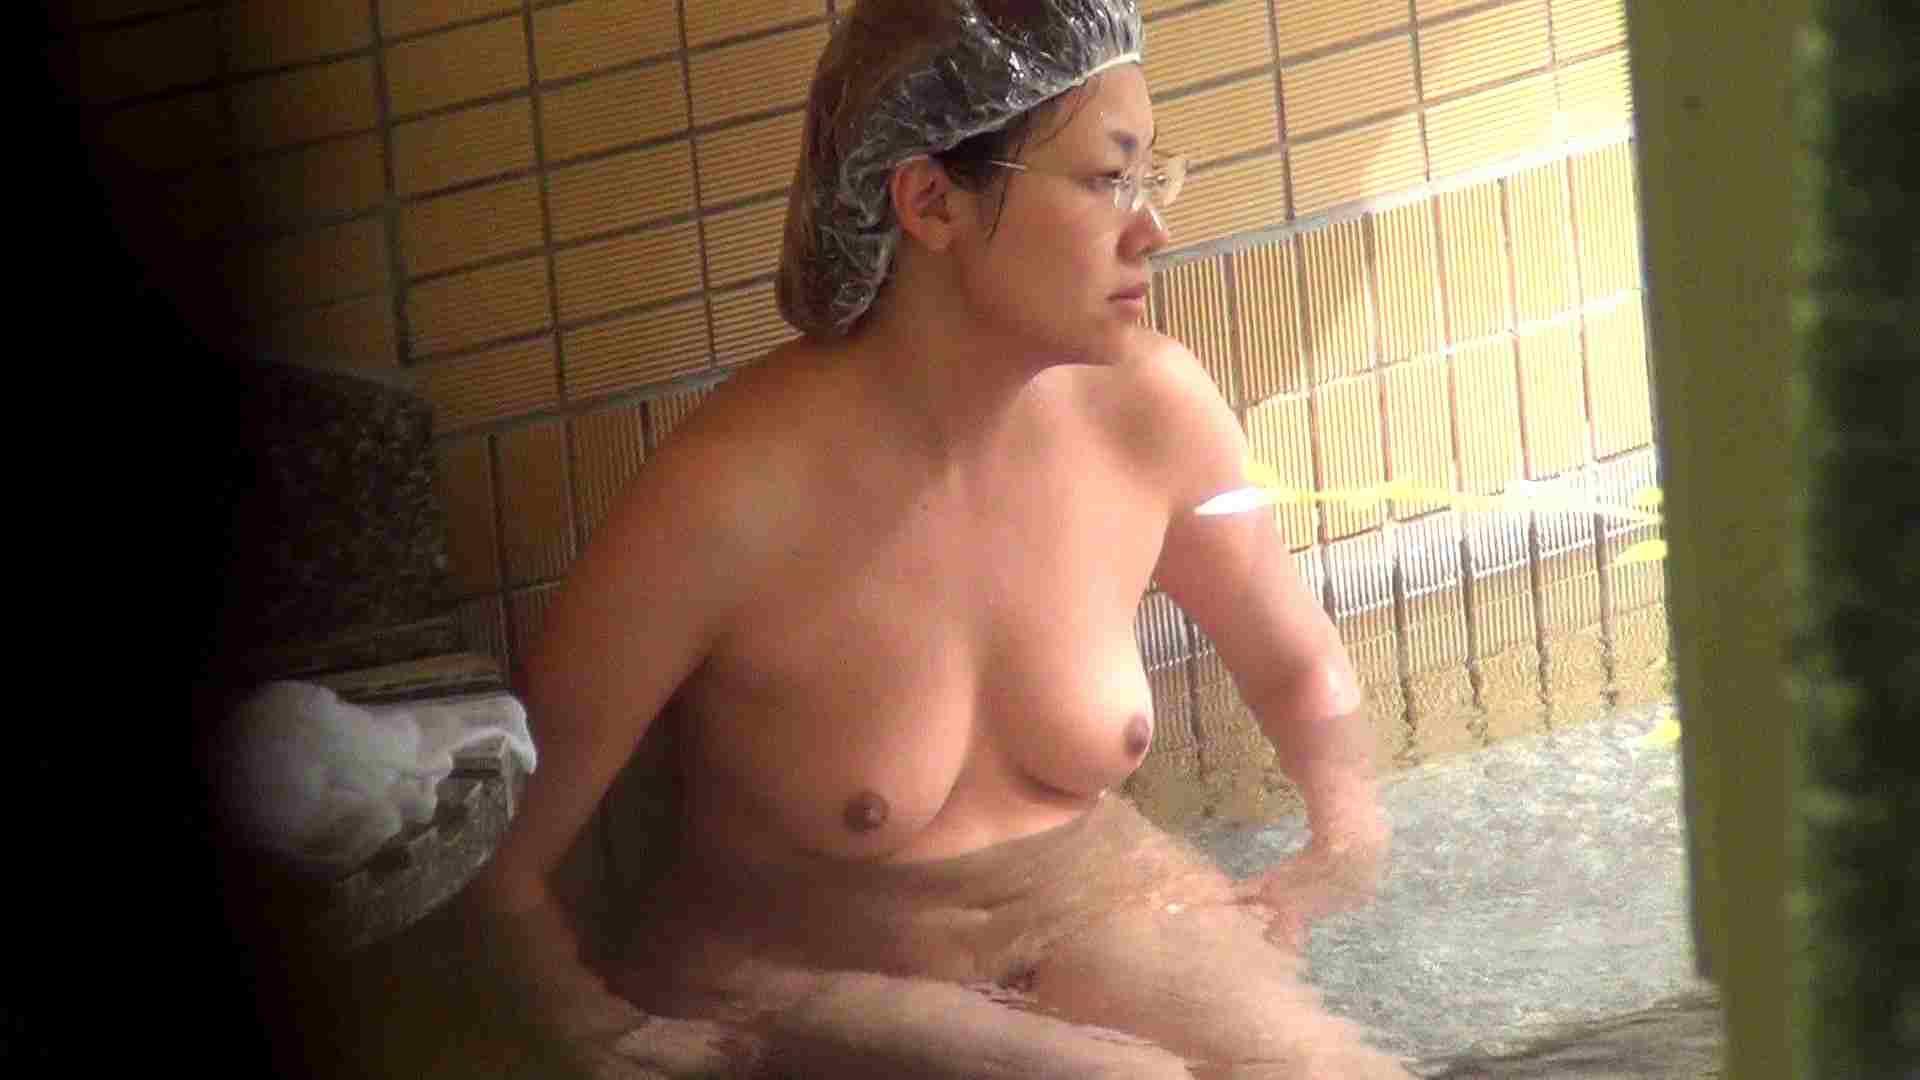 Aquaな露天風呂Vol.280 OLセックス | 盗撮  91画像 85